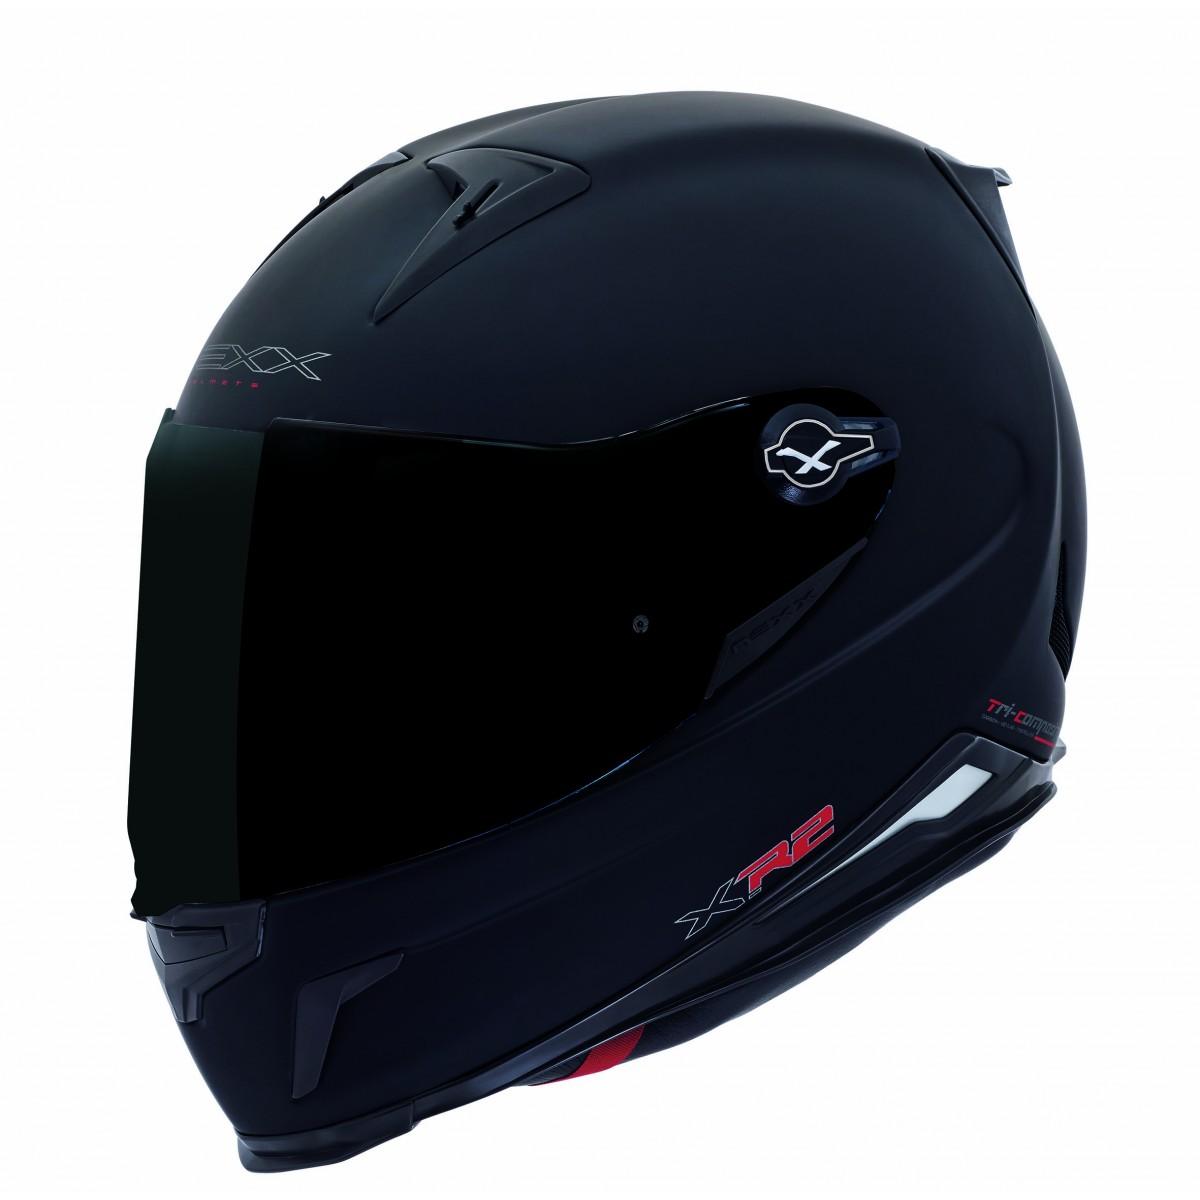 Capacete Nexx XR2 Plain Preto Fosco  - Nova Suzuki Motos e Acessórios